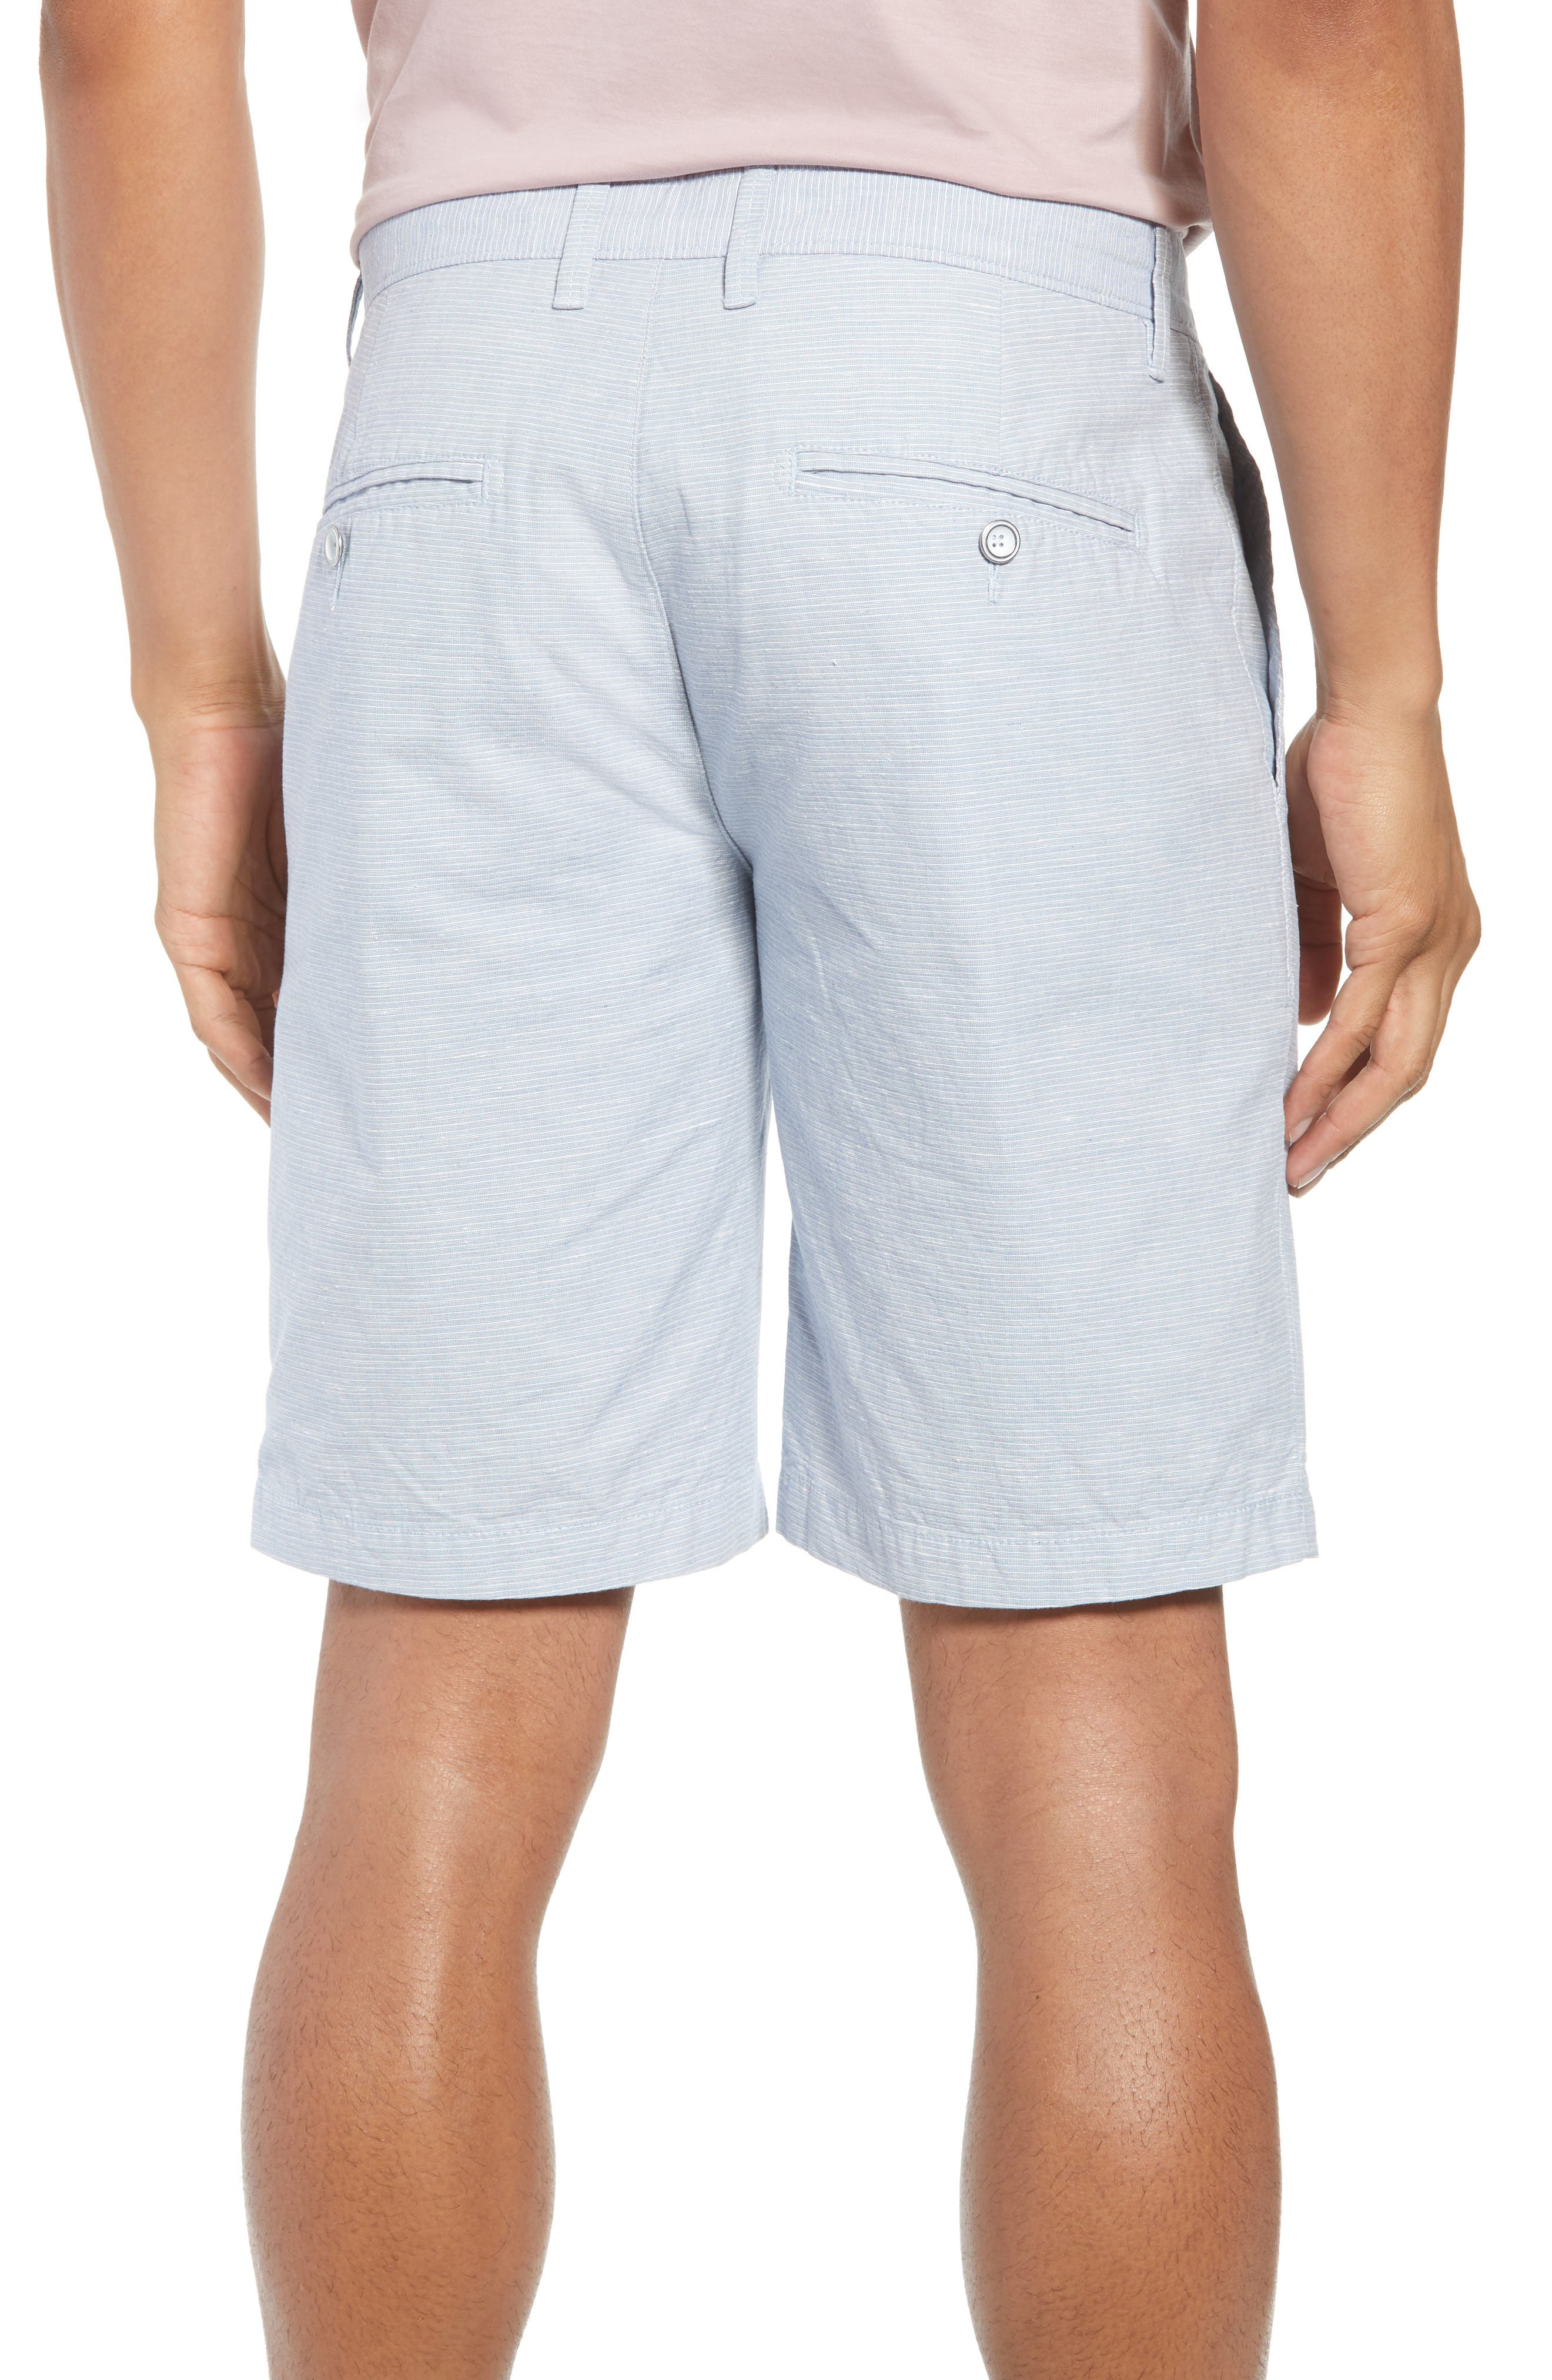 Stoke Valley Shorts,                             Alternate thumbnail 2, color,                             SKY